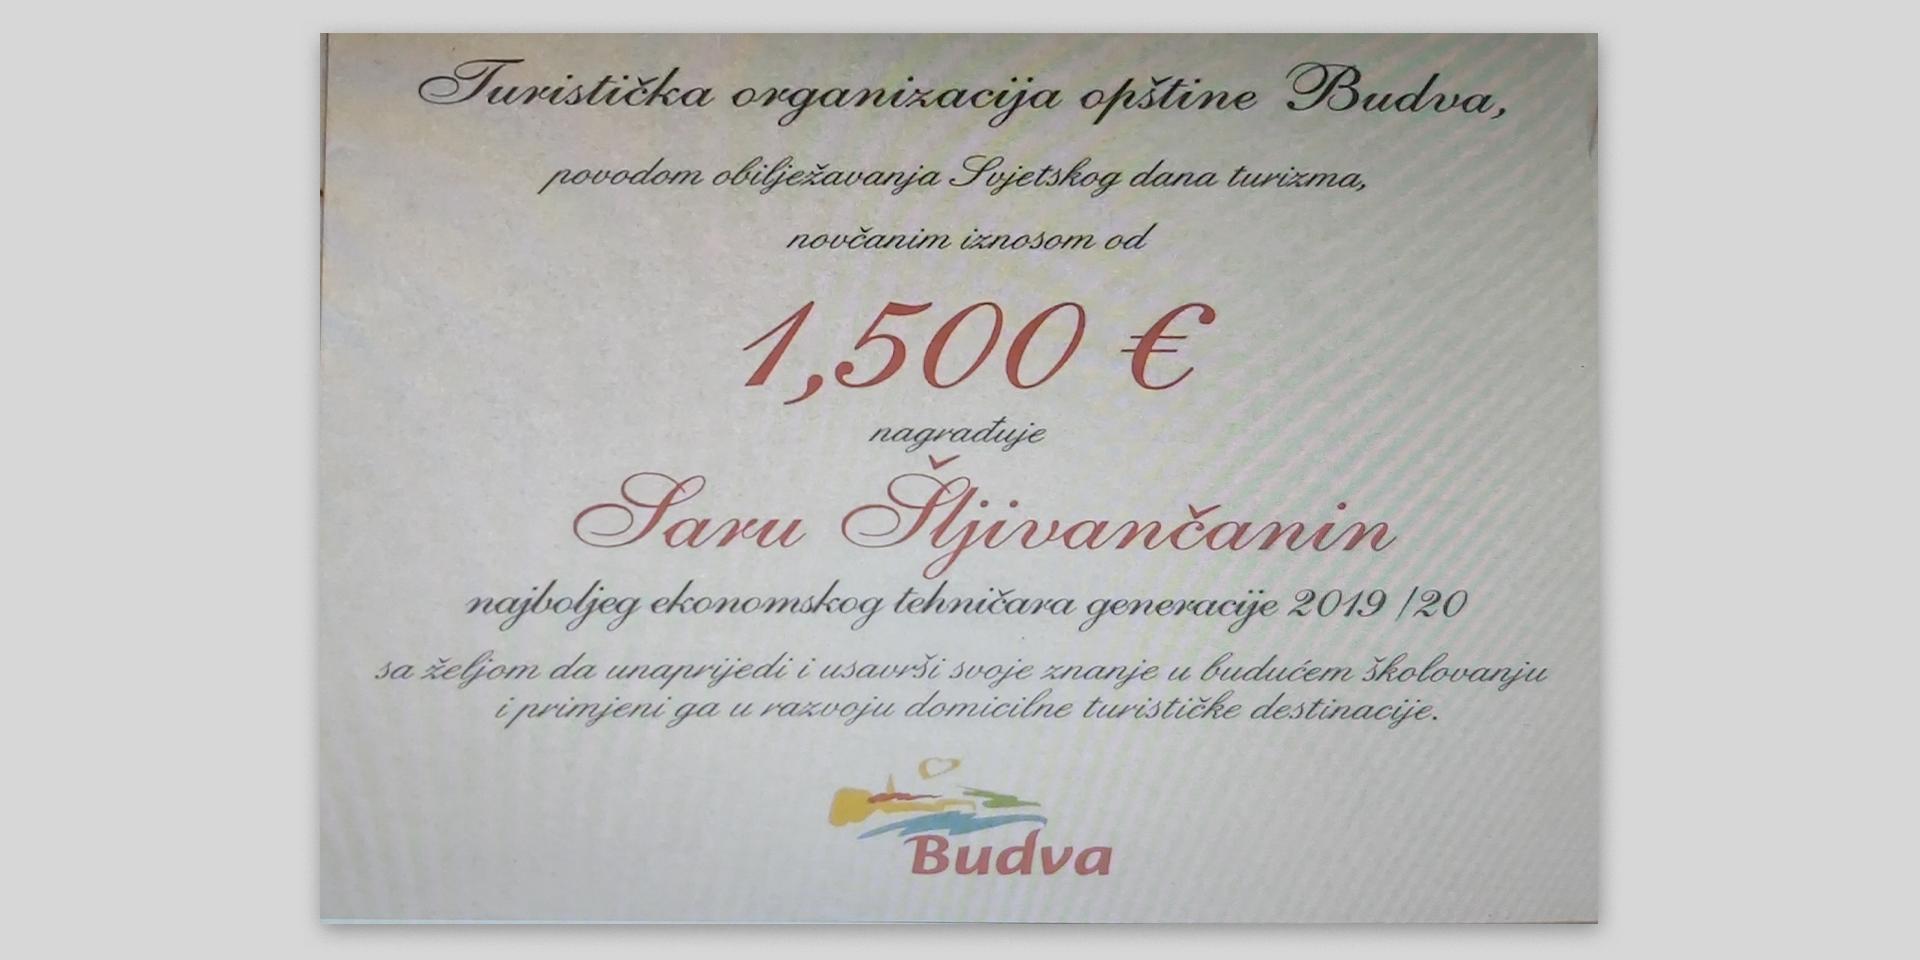 budva-weather budva-caffes budva-sea budva-activities budva-apartments